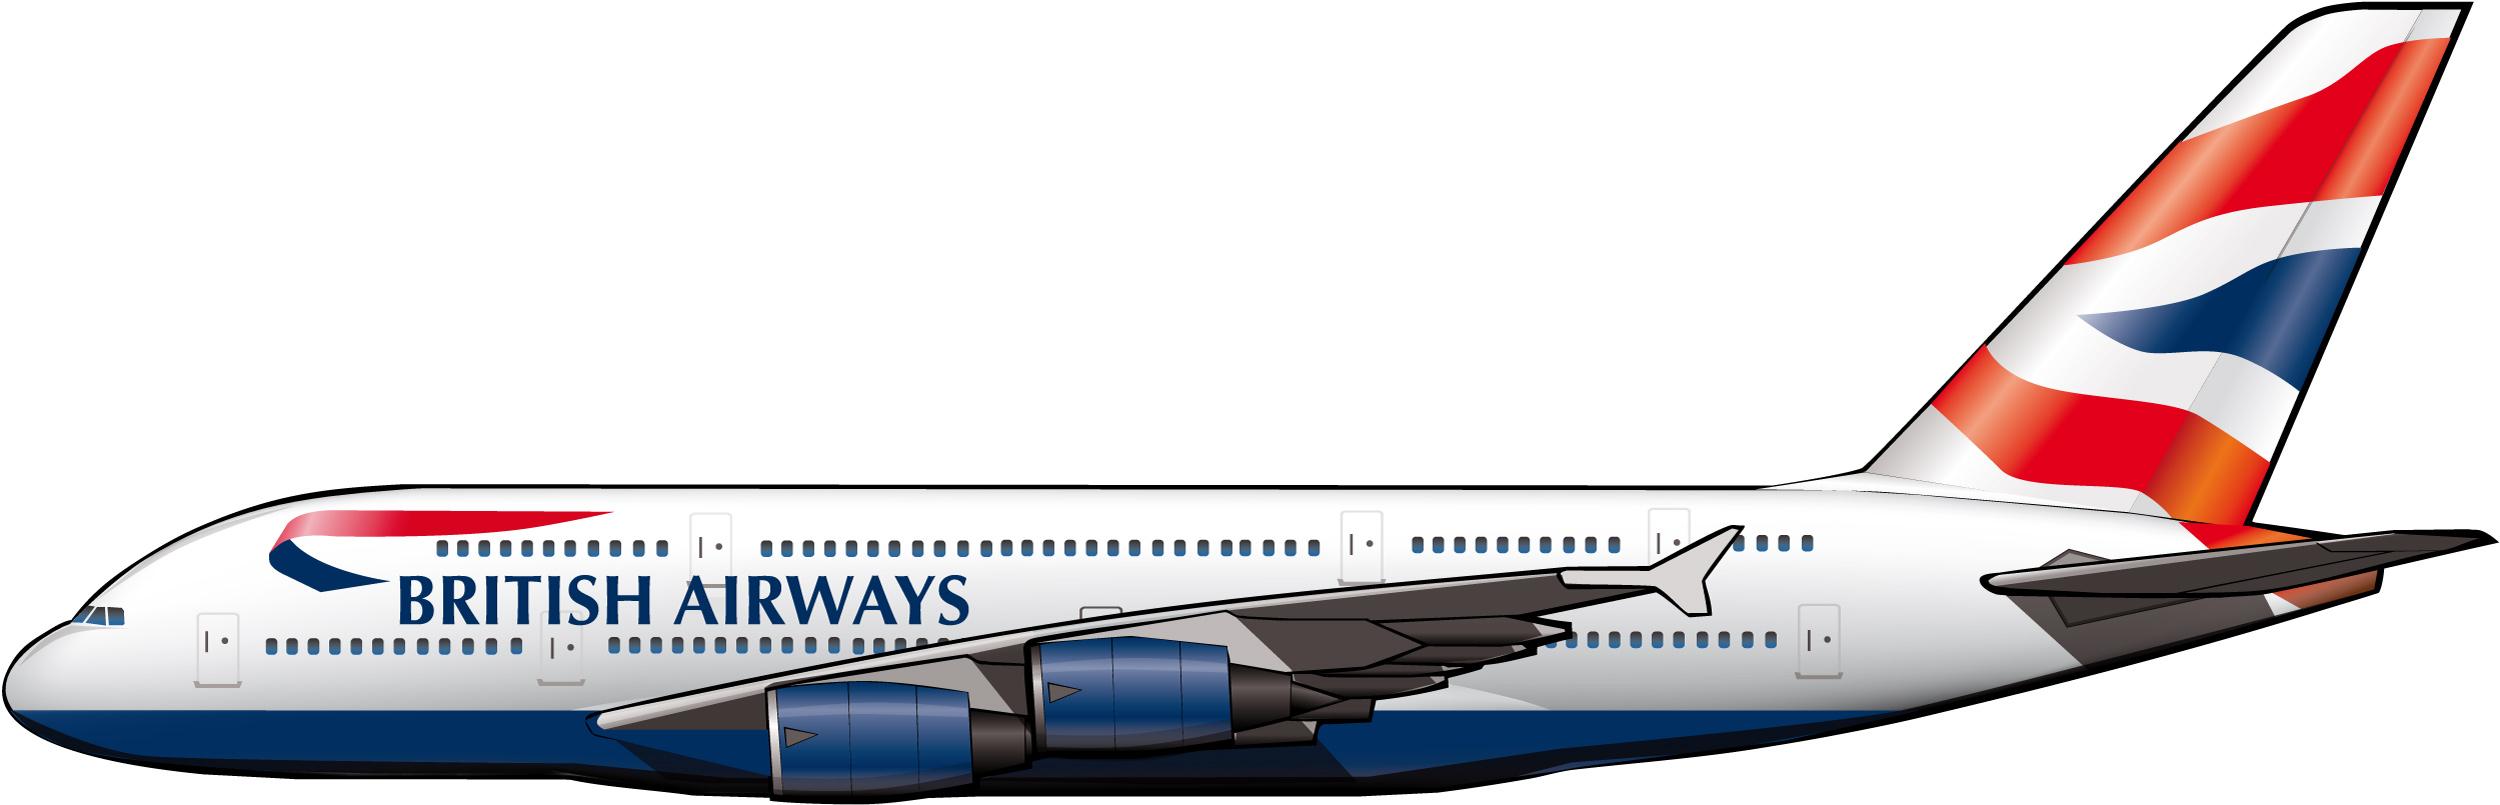 airbusa380ba2013